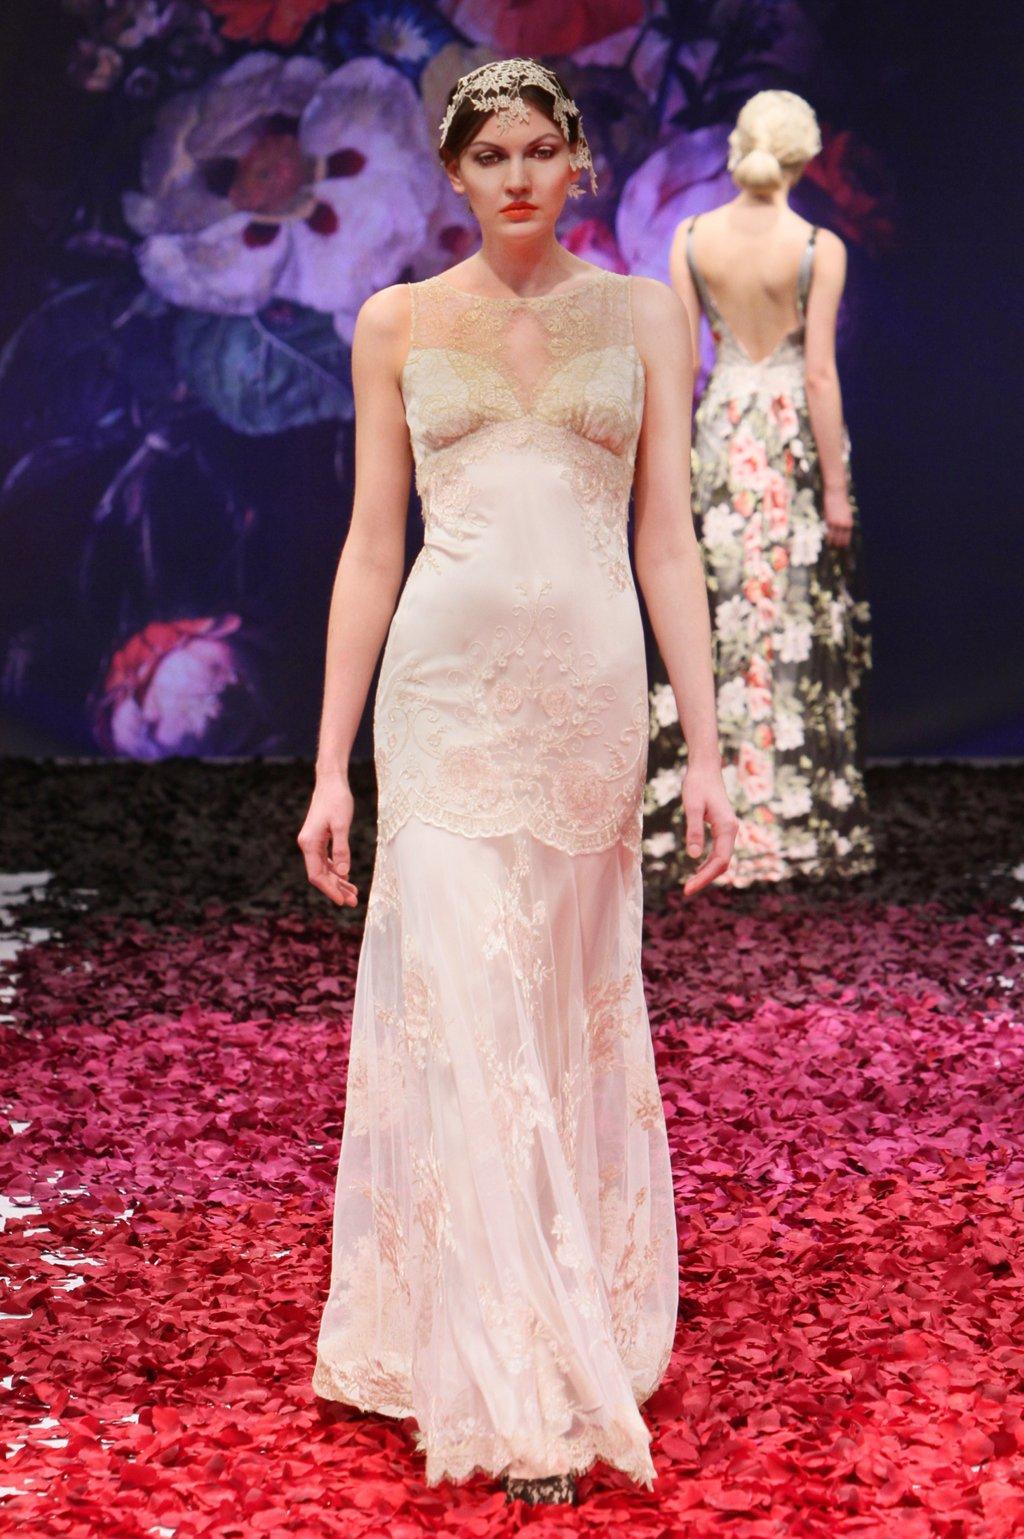 Ambrosia-wedding-dress-by-claire-pettibone-2014-still-life-bridal-collection.full